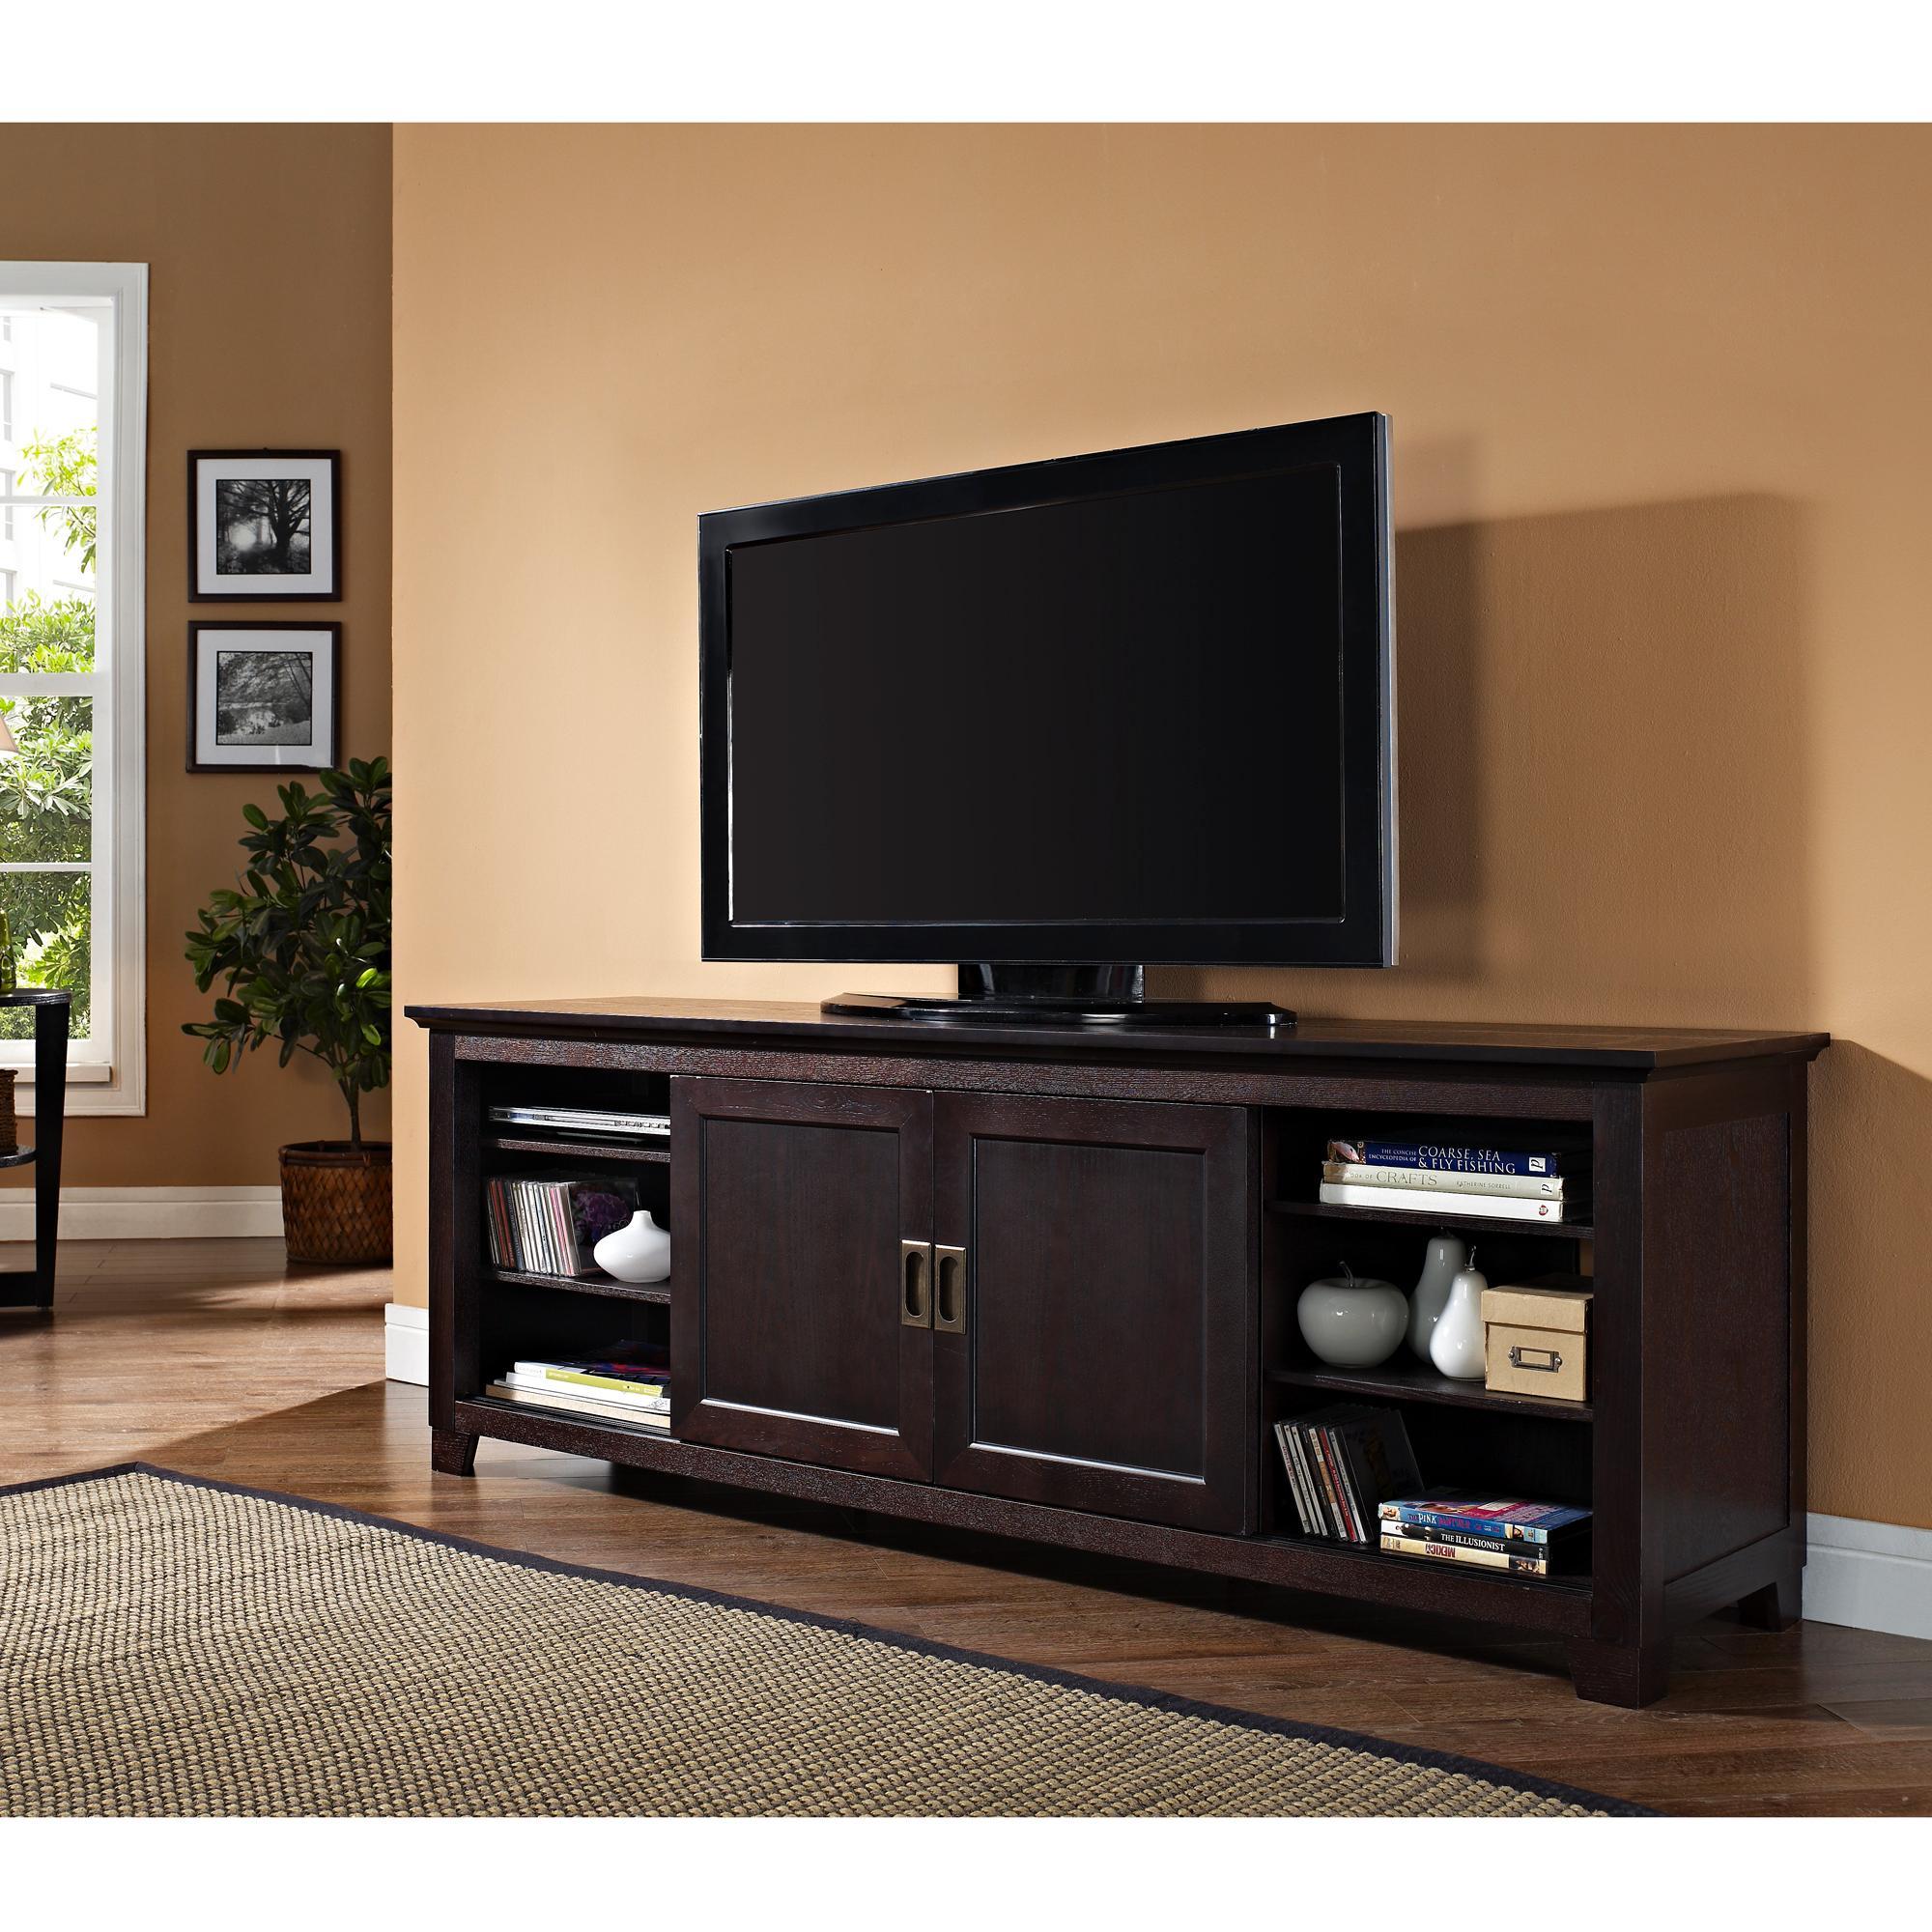 we furniture 70 wood tv stand with sliding doors entertainment stands. Black Bedroom Furniture Sets. Home Design Ideas